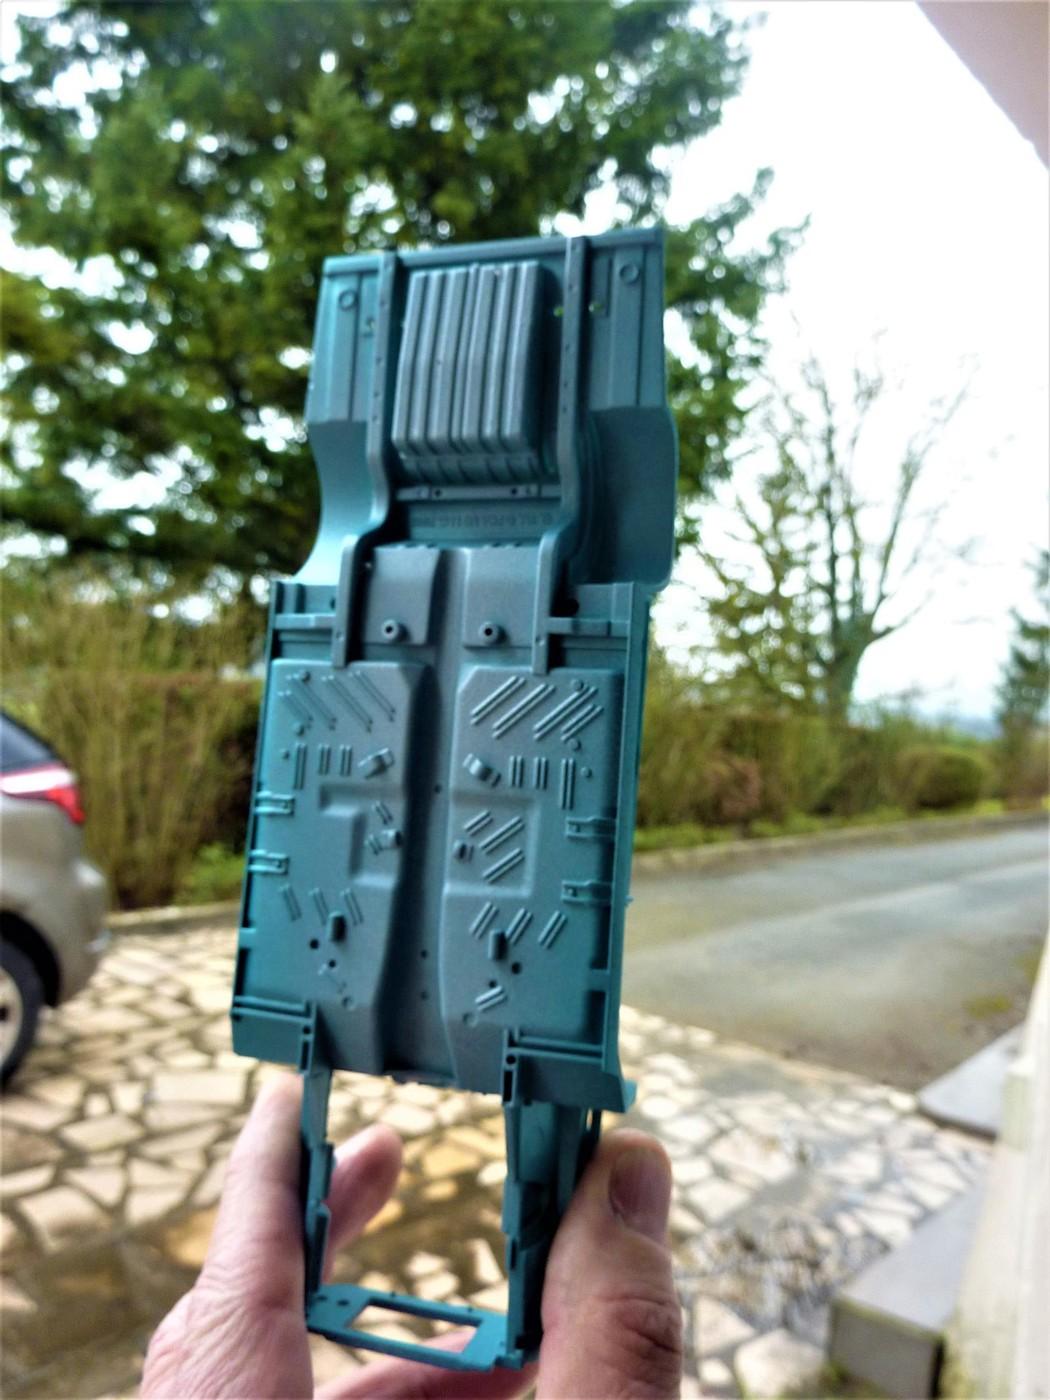 Projet Plymouth Satellite 65 Términée  Photo1-vi